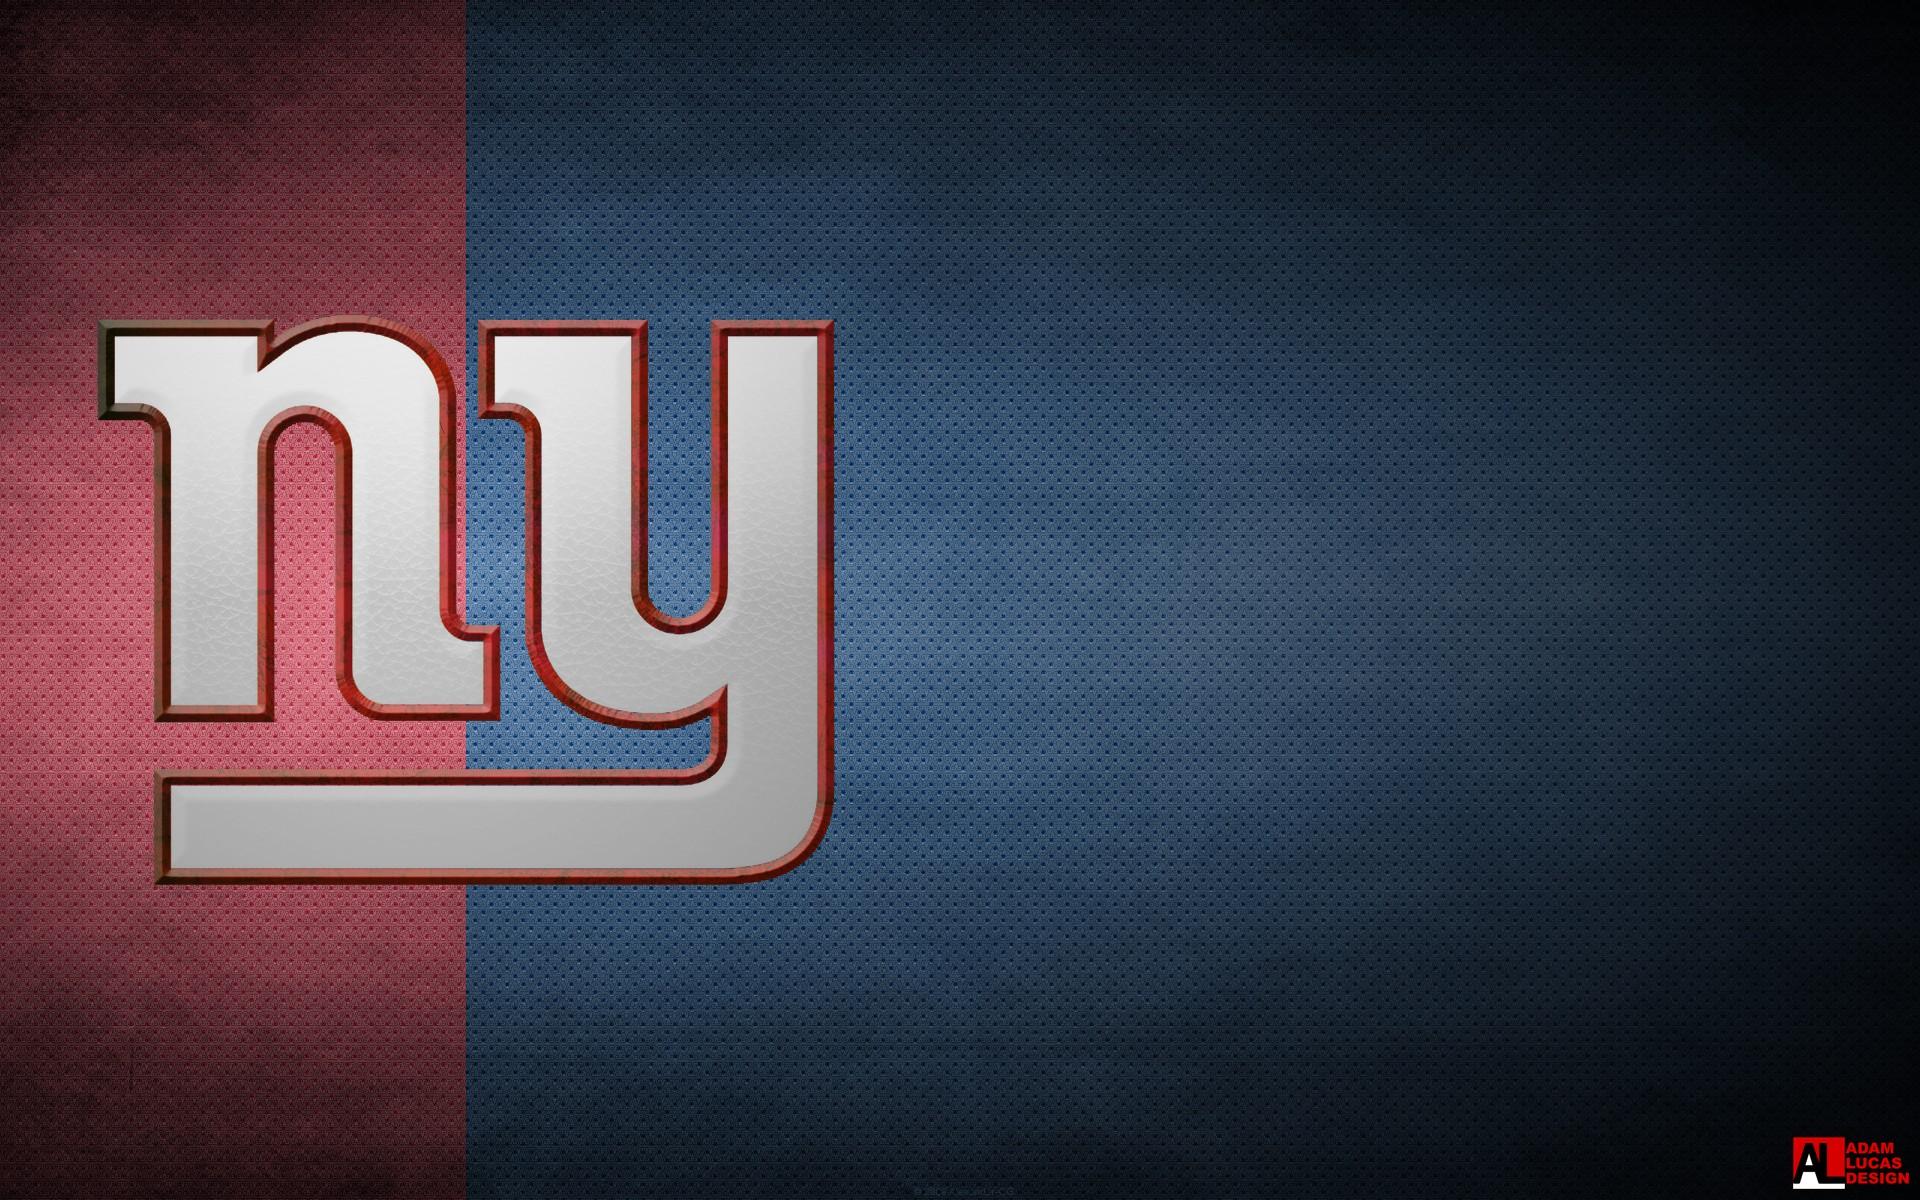 New York Giants wallpaper ·① Download free beautiful ...